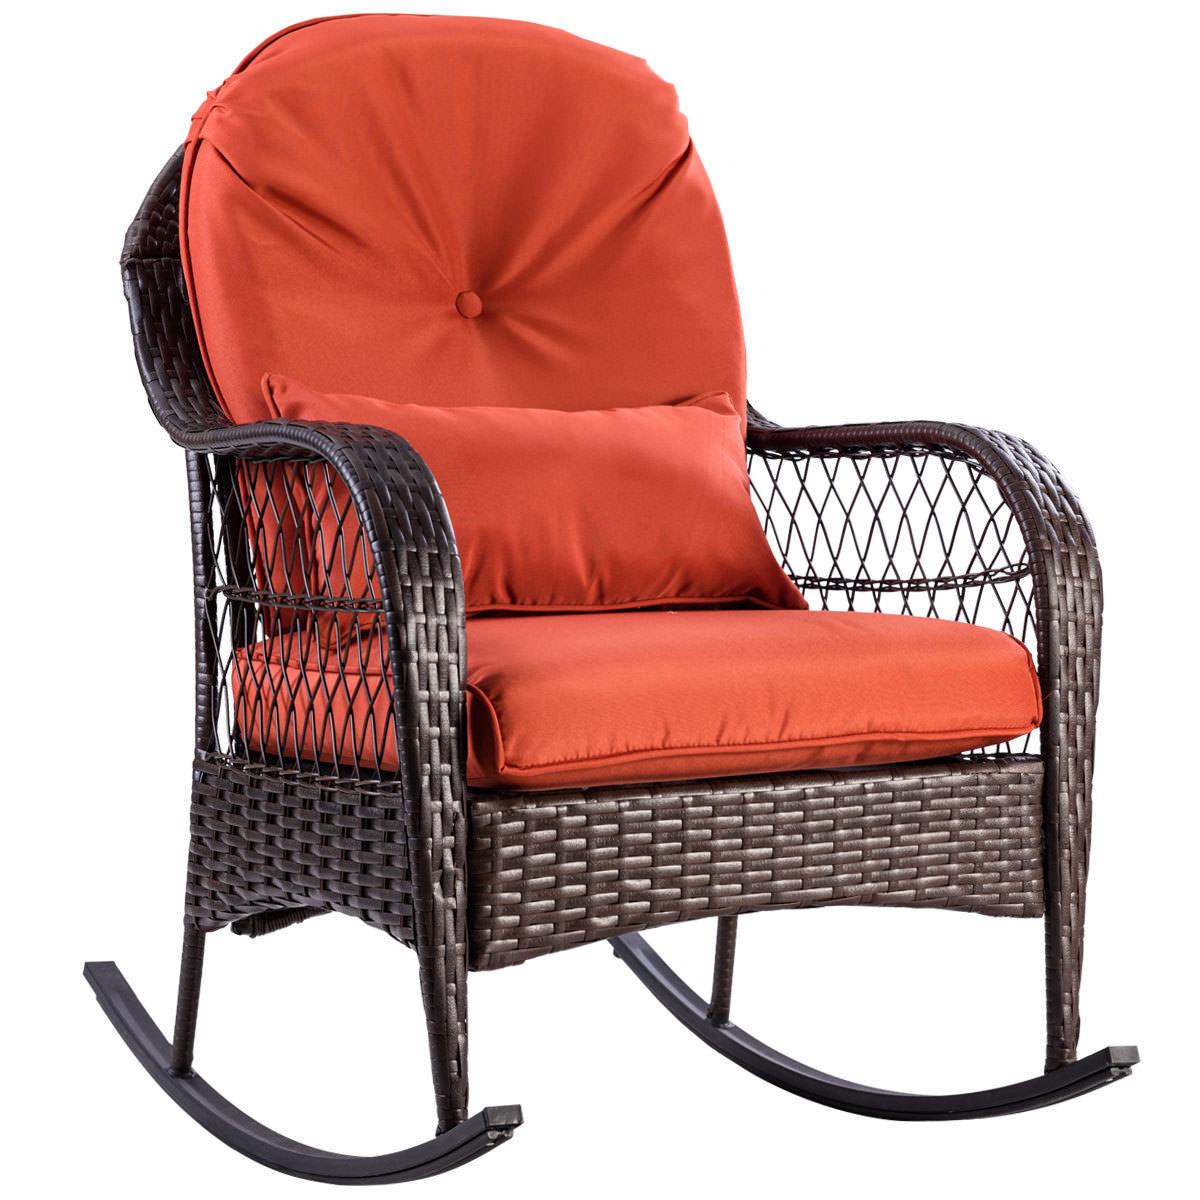 Costway Outdoor Wicker Rocking Chair Porch Deck Rocker Patio Furniture w/ Cushion